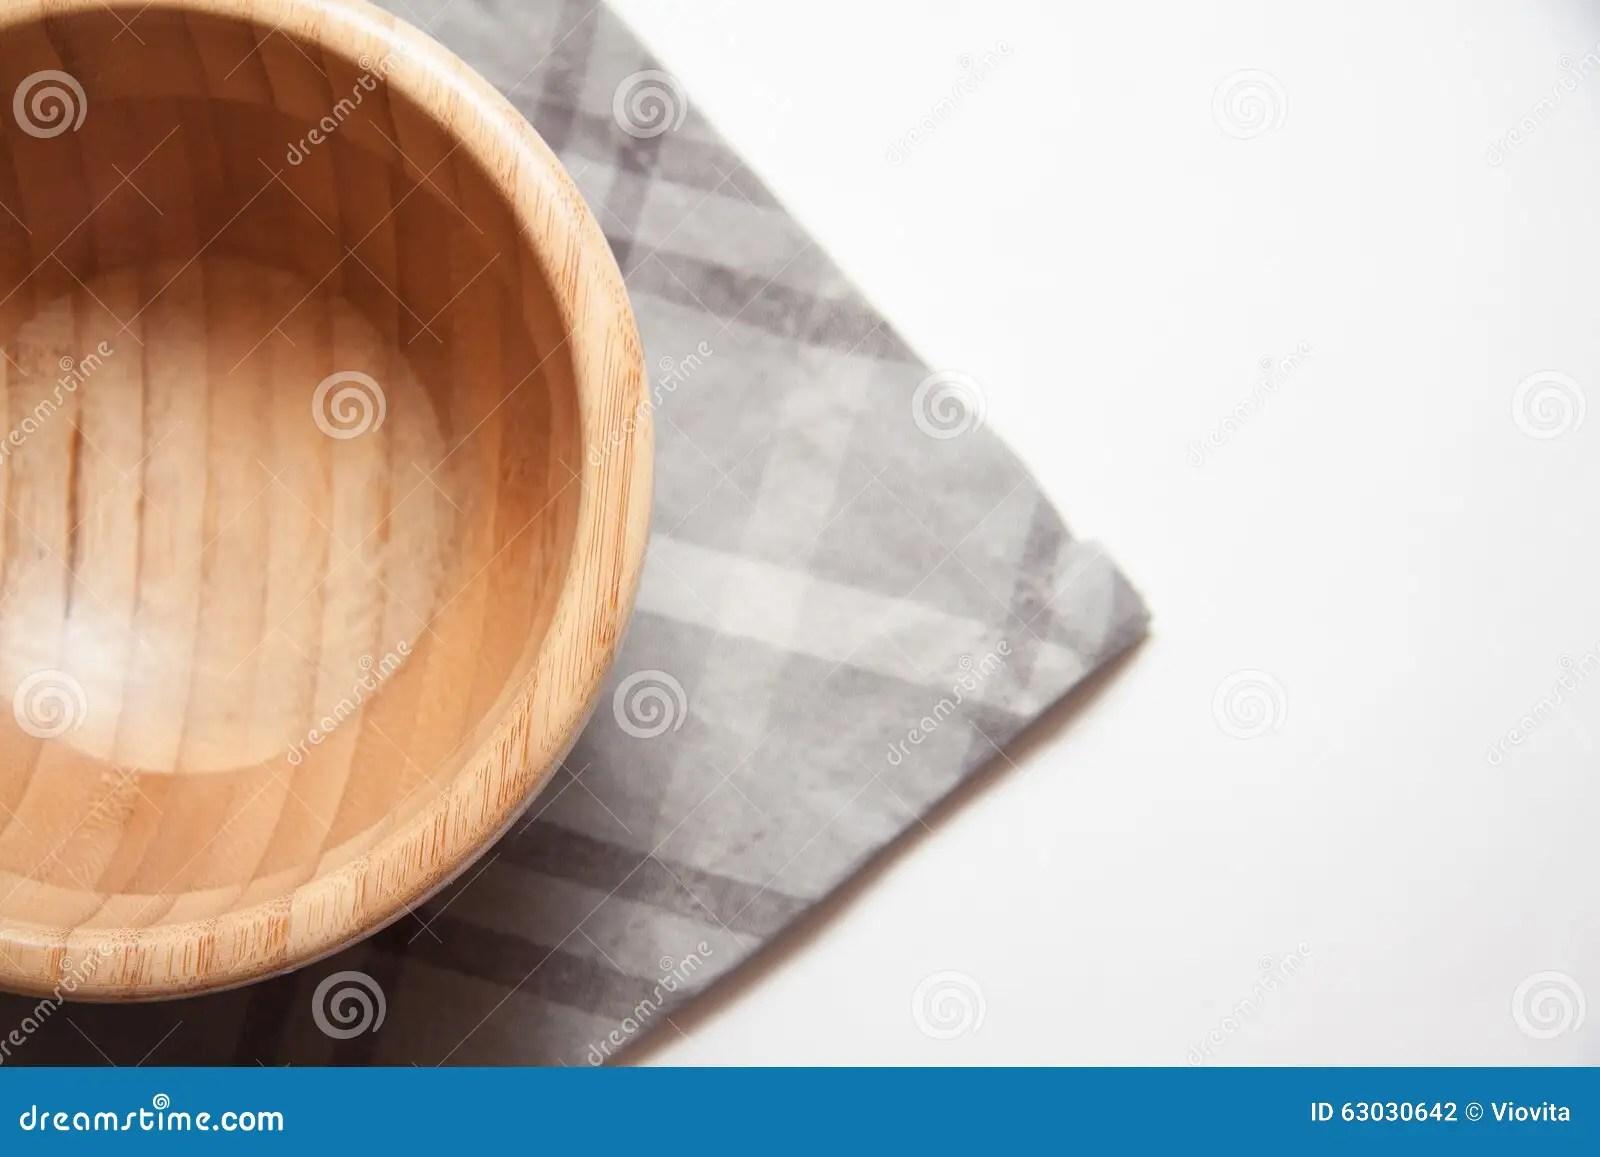 gray kitchen towels how to update laminate cabinets 在灰色毛巾的自然碗库存照片 图片包括有波儿地克的 地空通信系统 聚会 厨房器物 有毛巾的小木碗